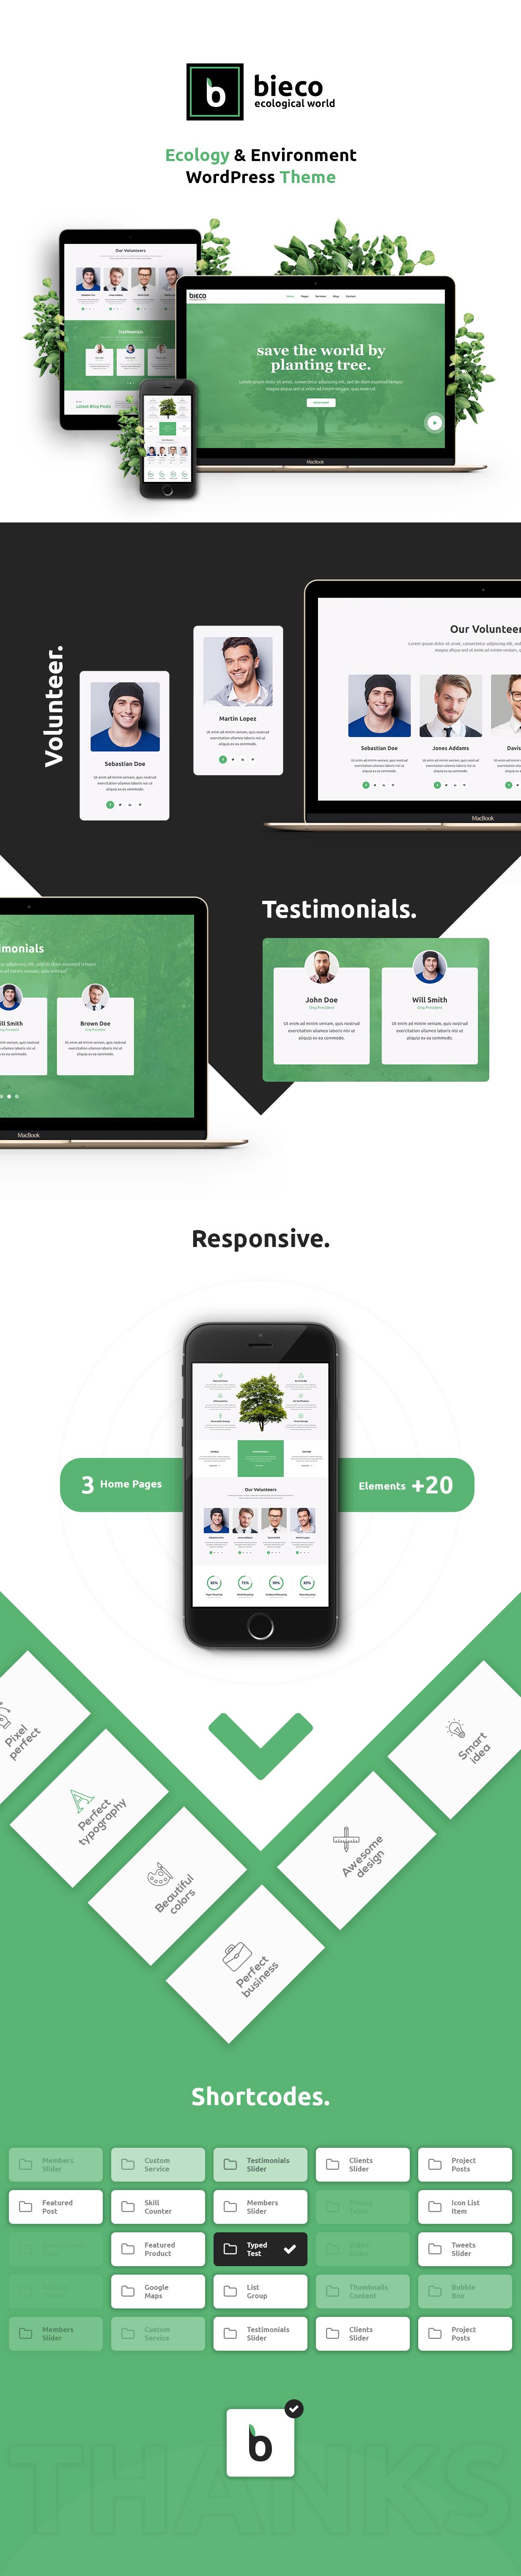 Bieco - Environment & Ecology WordPress Theme - 1